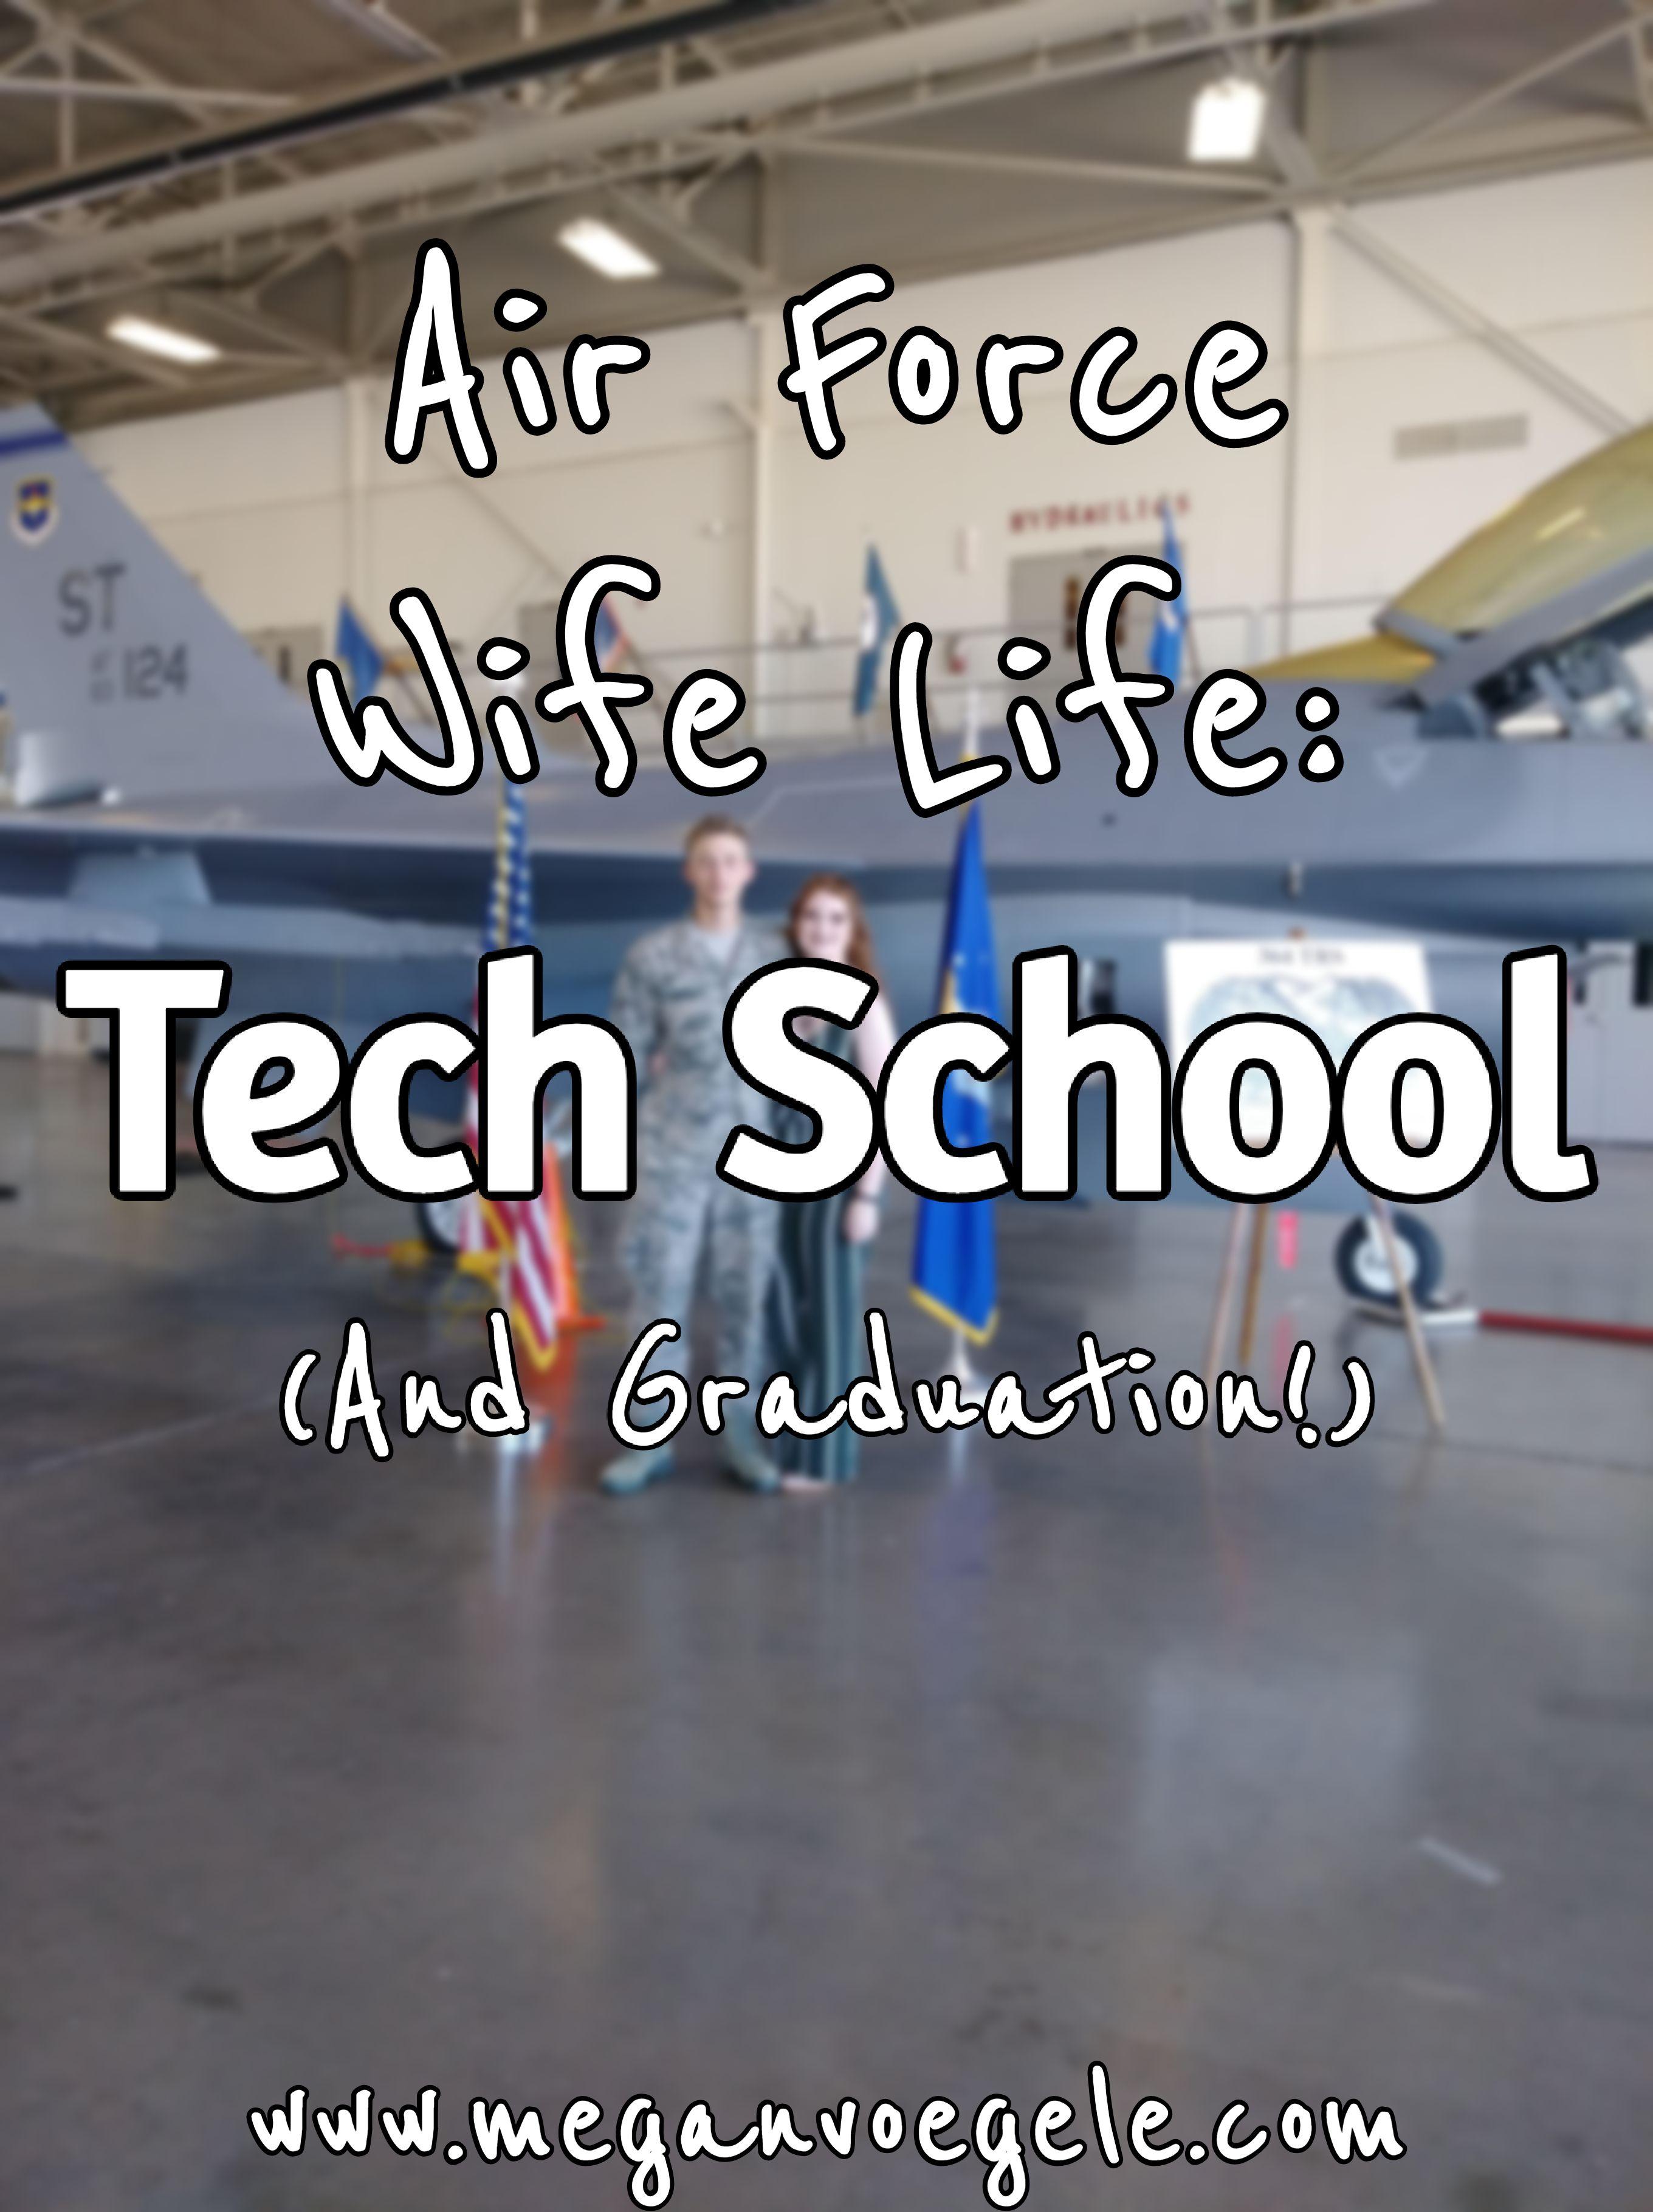 Air Force TECH SCHOOL LIFE